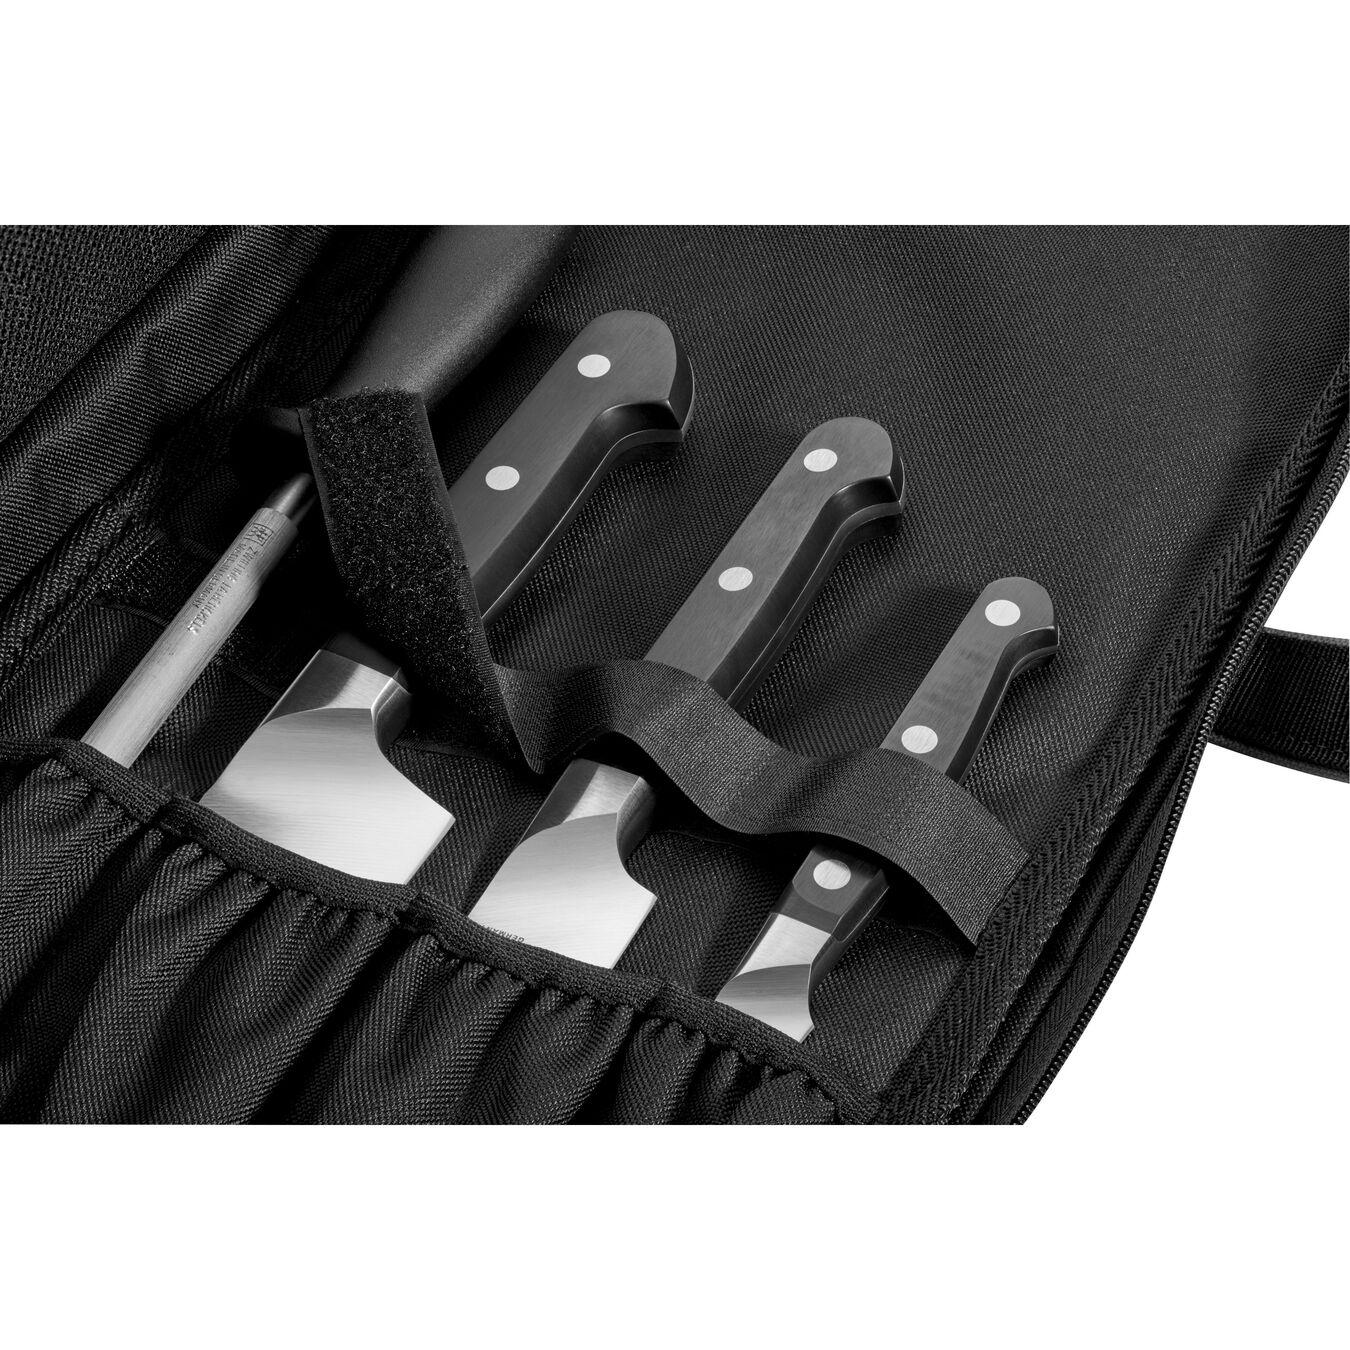 Knife case, 12,,large 8